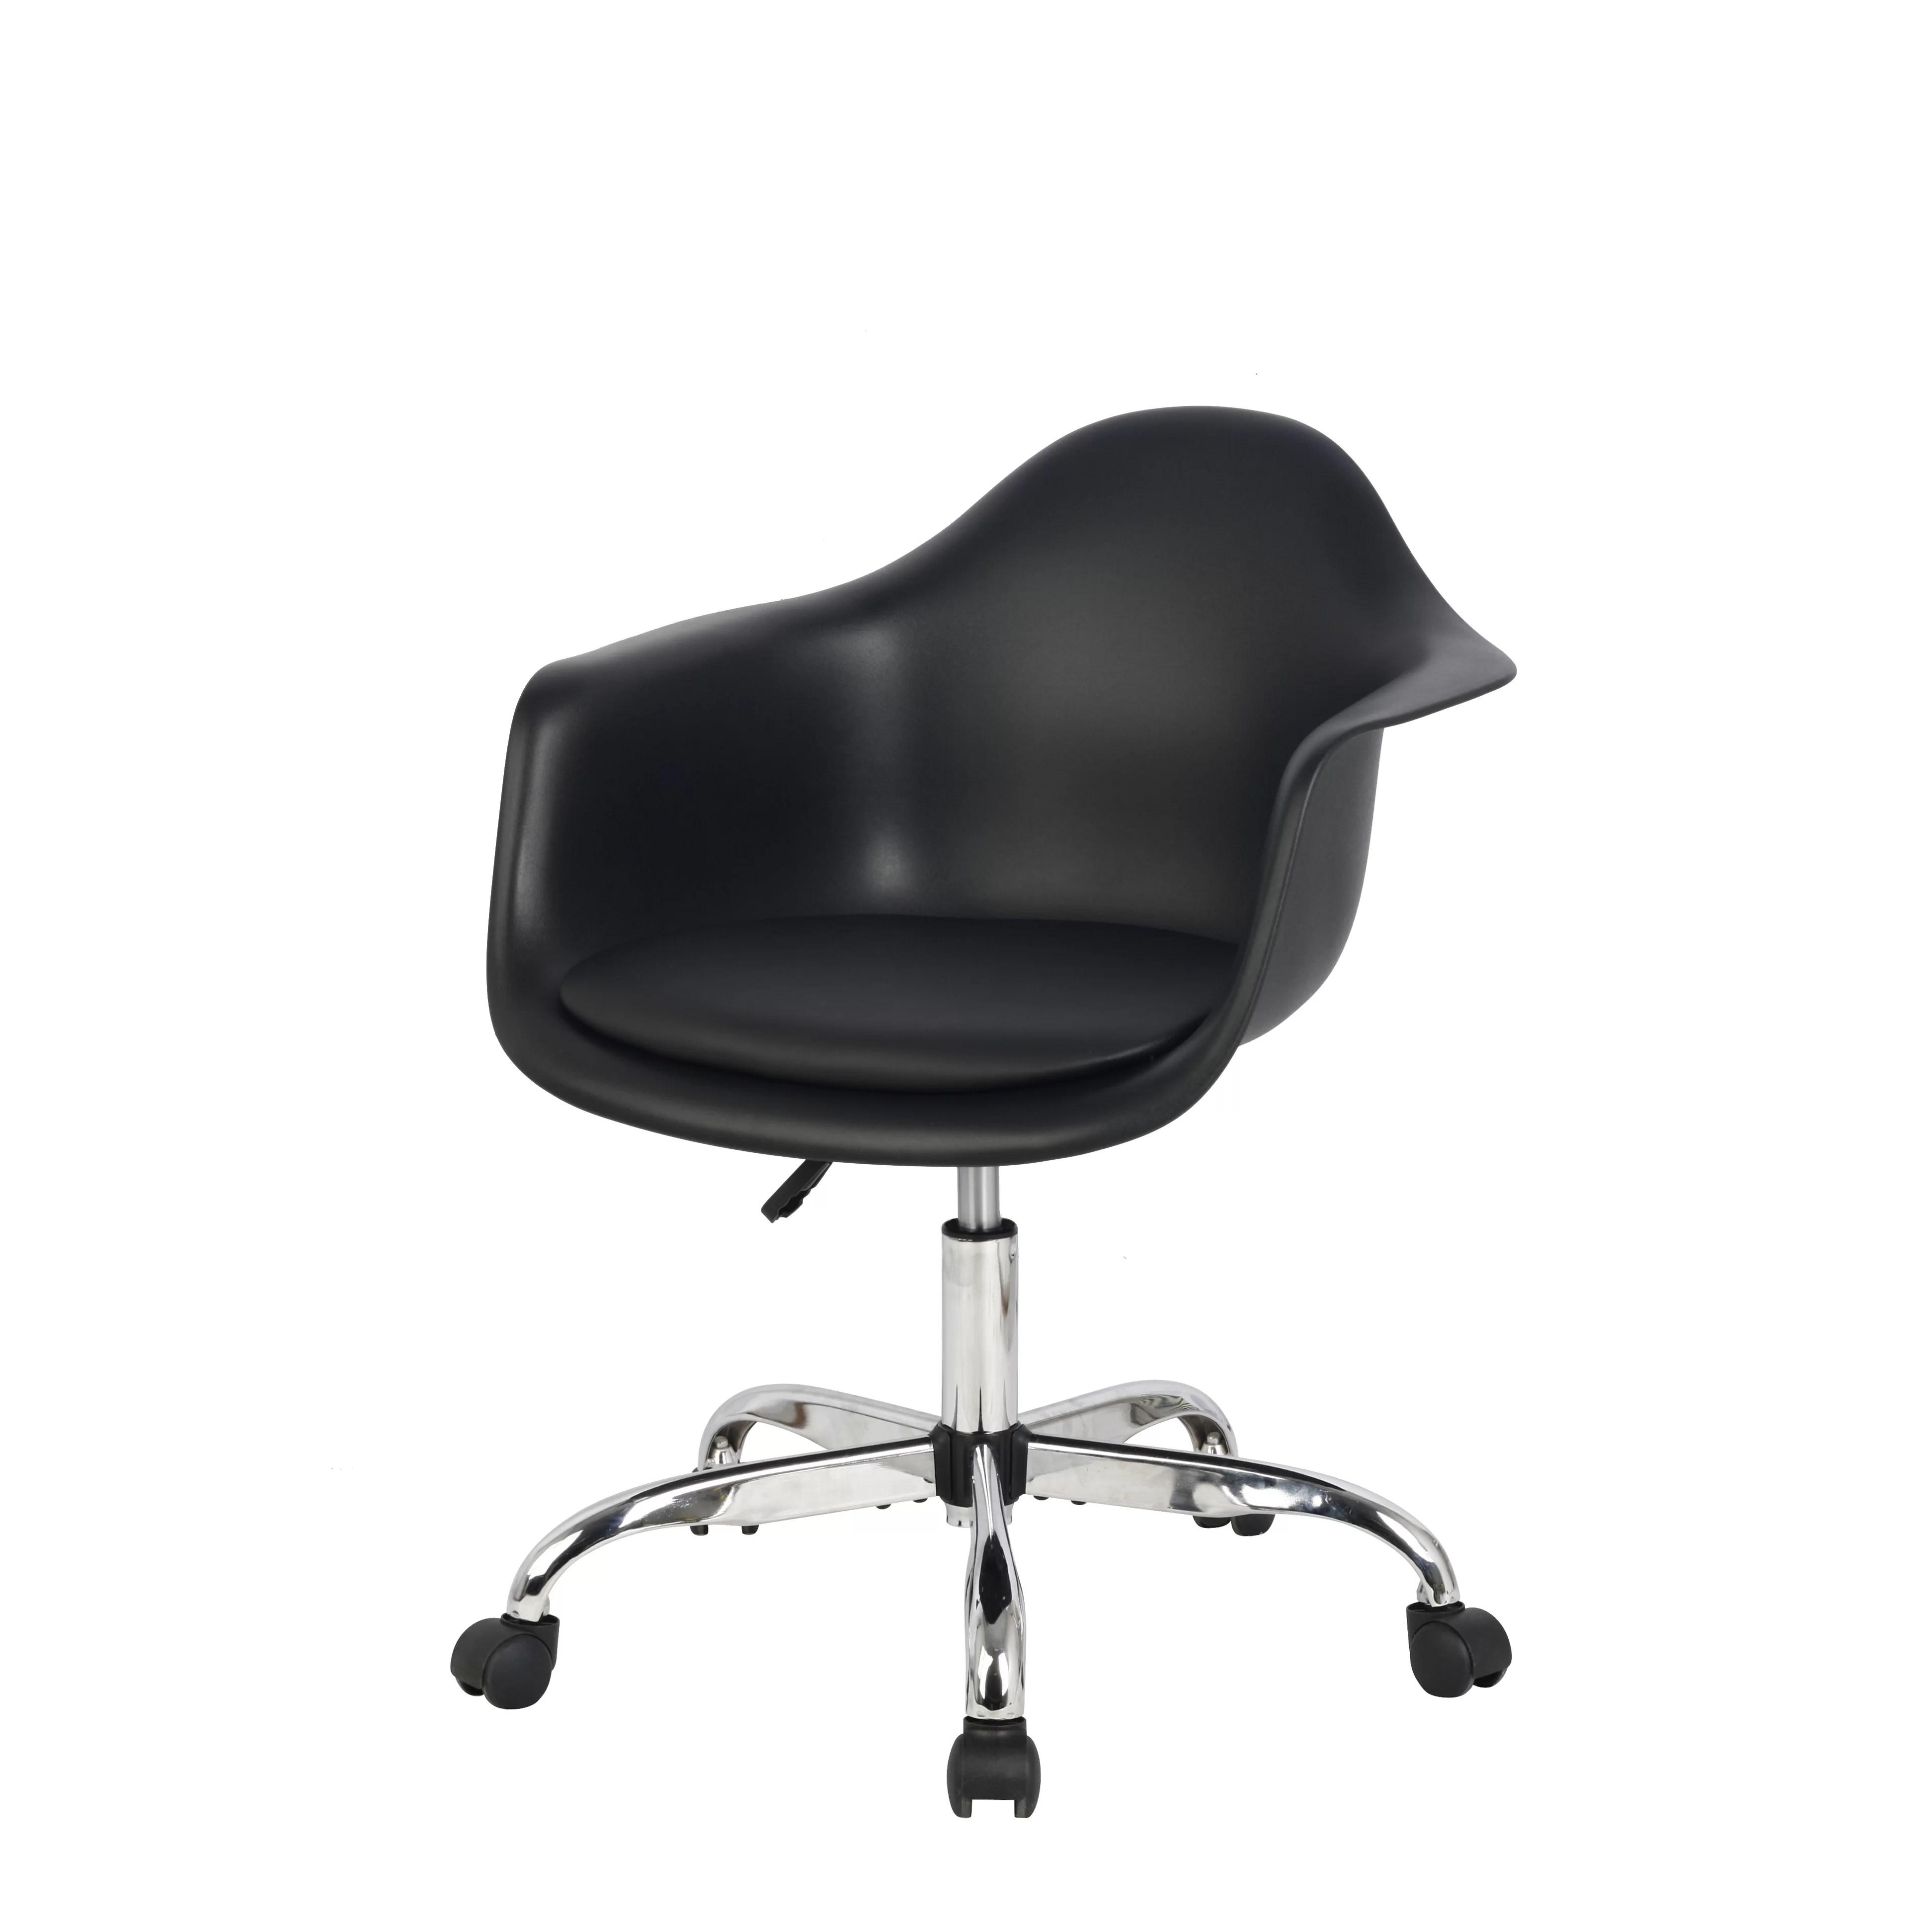 Varick Gallery Marine Park Rolling Desk Chair & Reviews